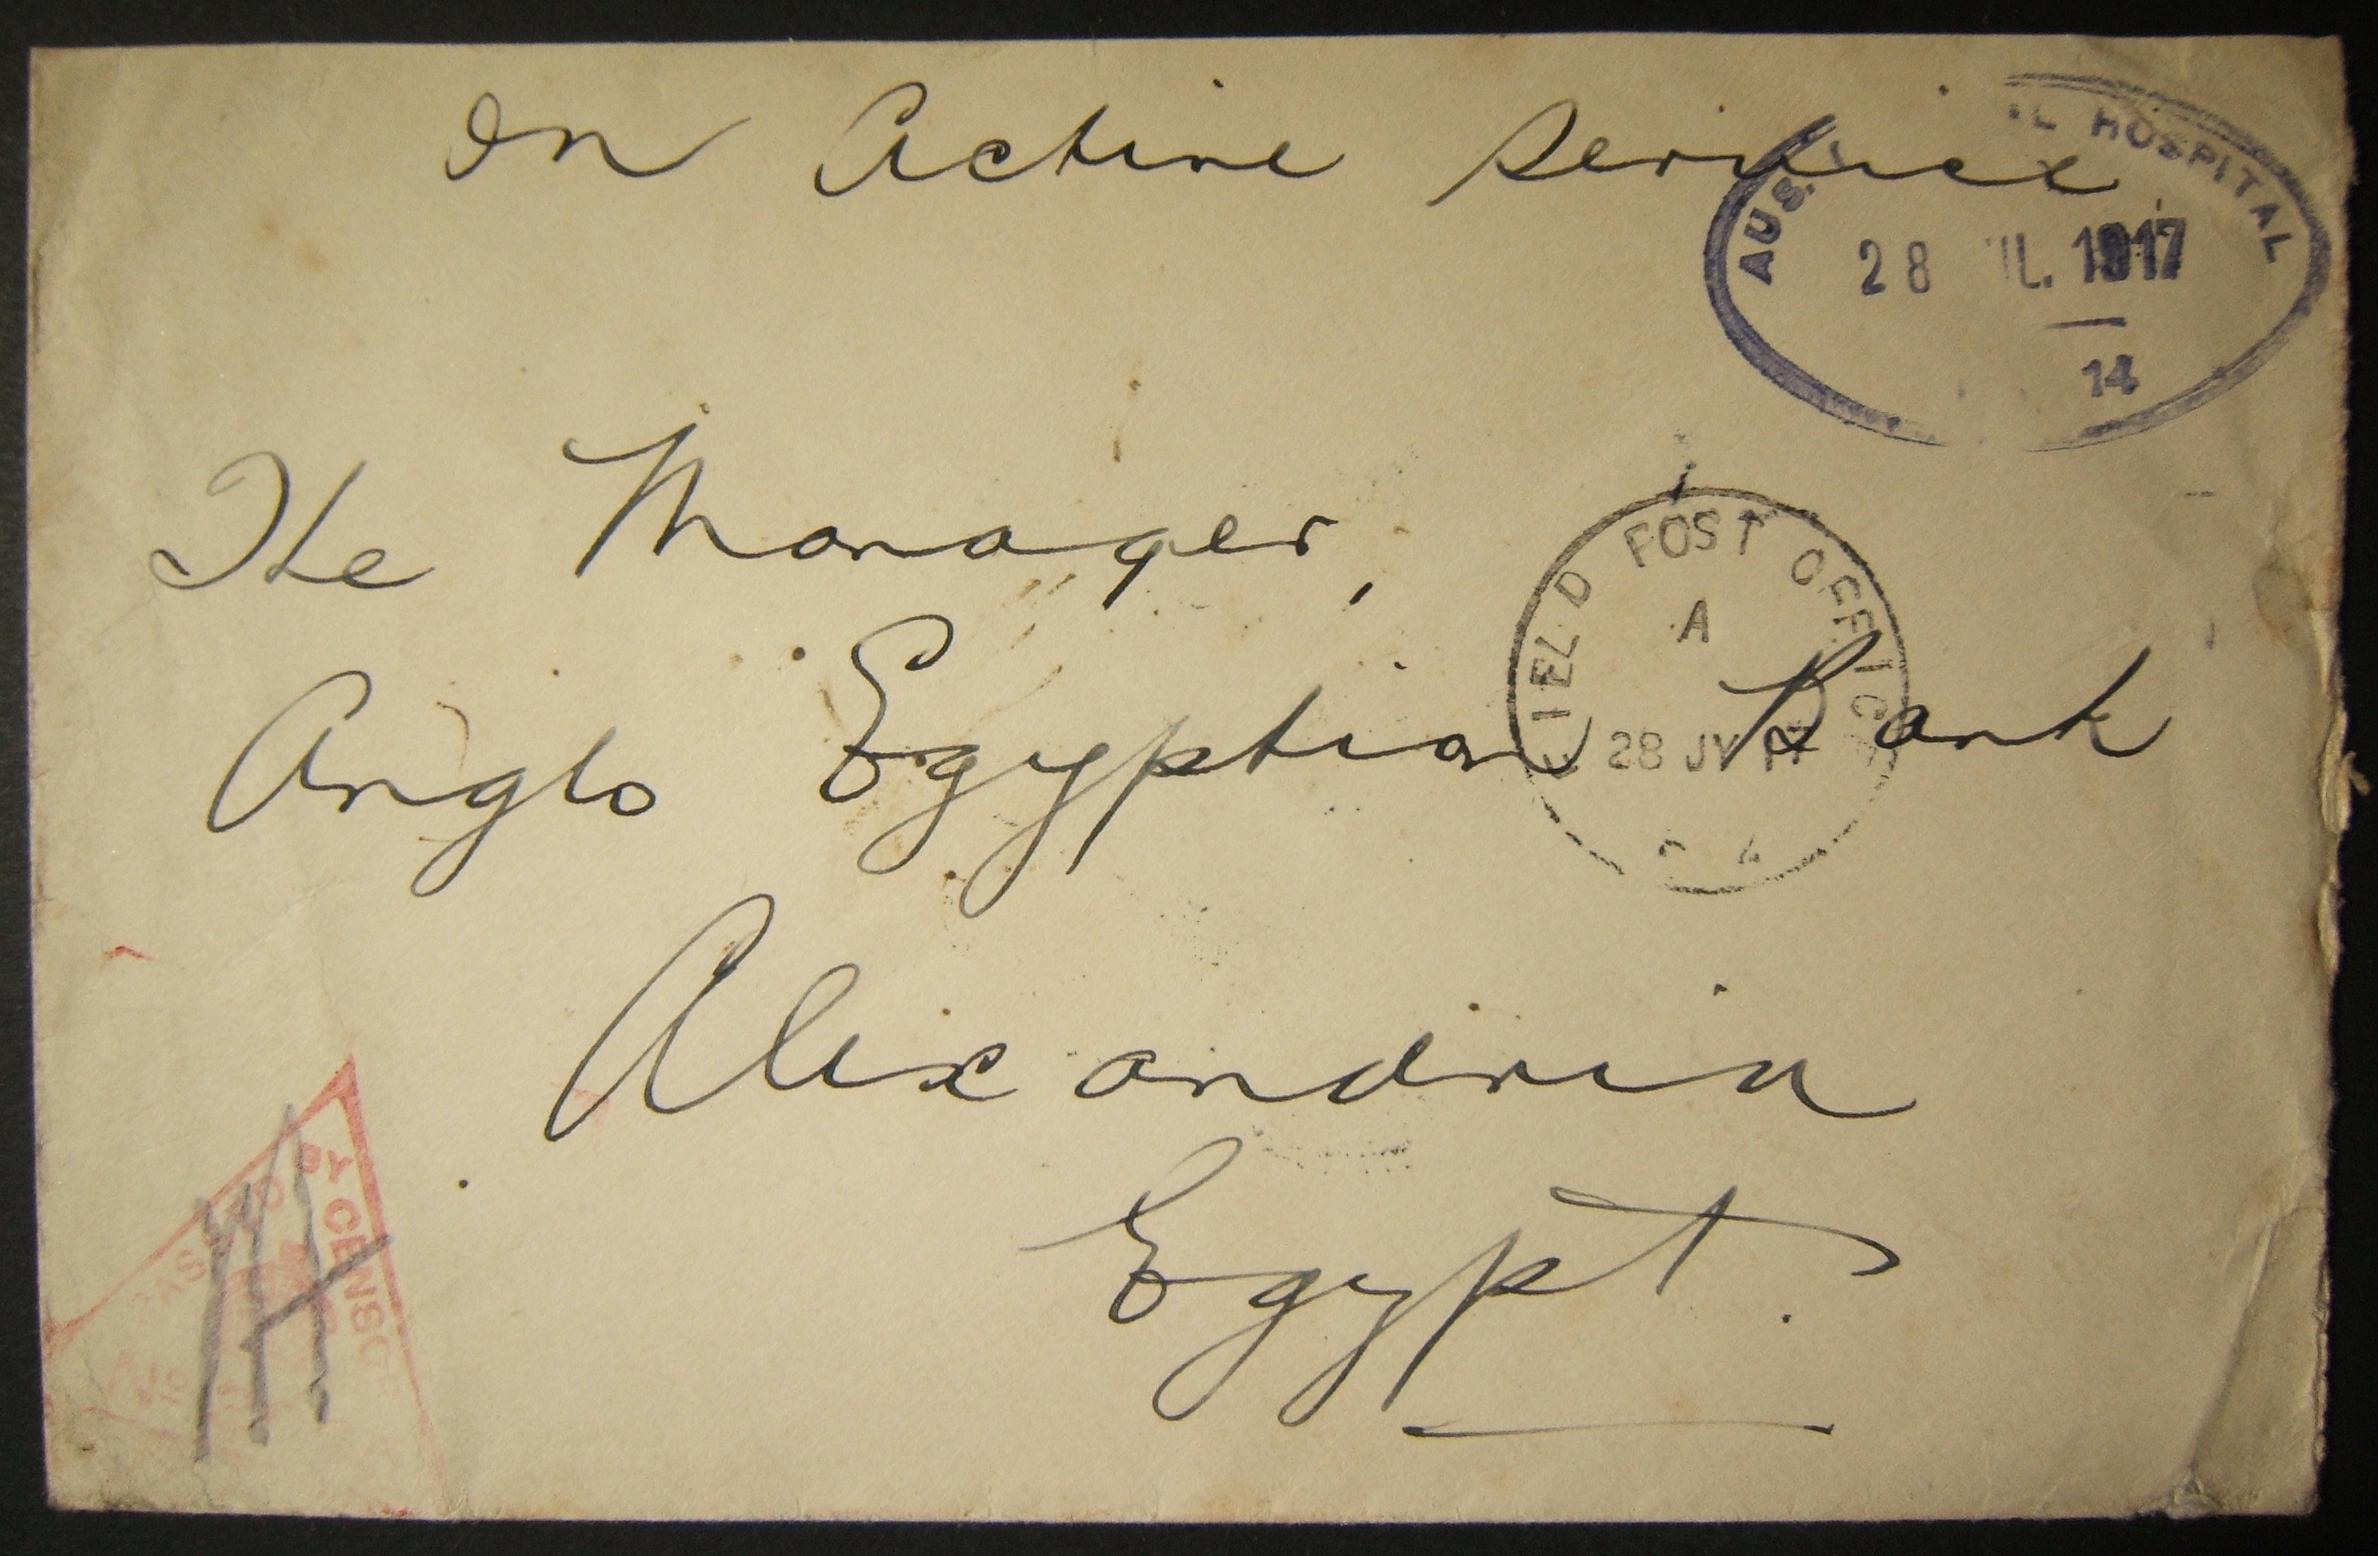 7/1917 WWI מצרים דואר צבאי אוסטרלי מ- ABBASSIA דרך FPO F2 + cachet החולים